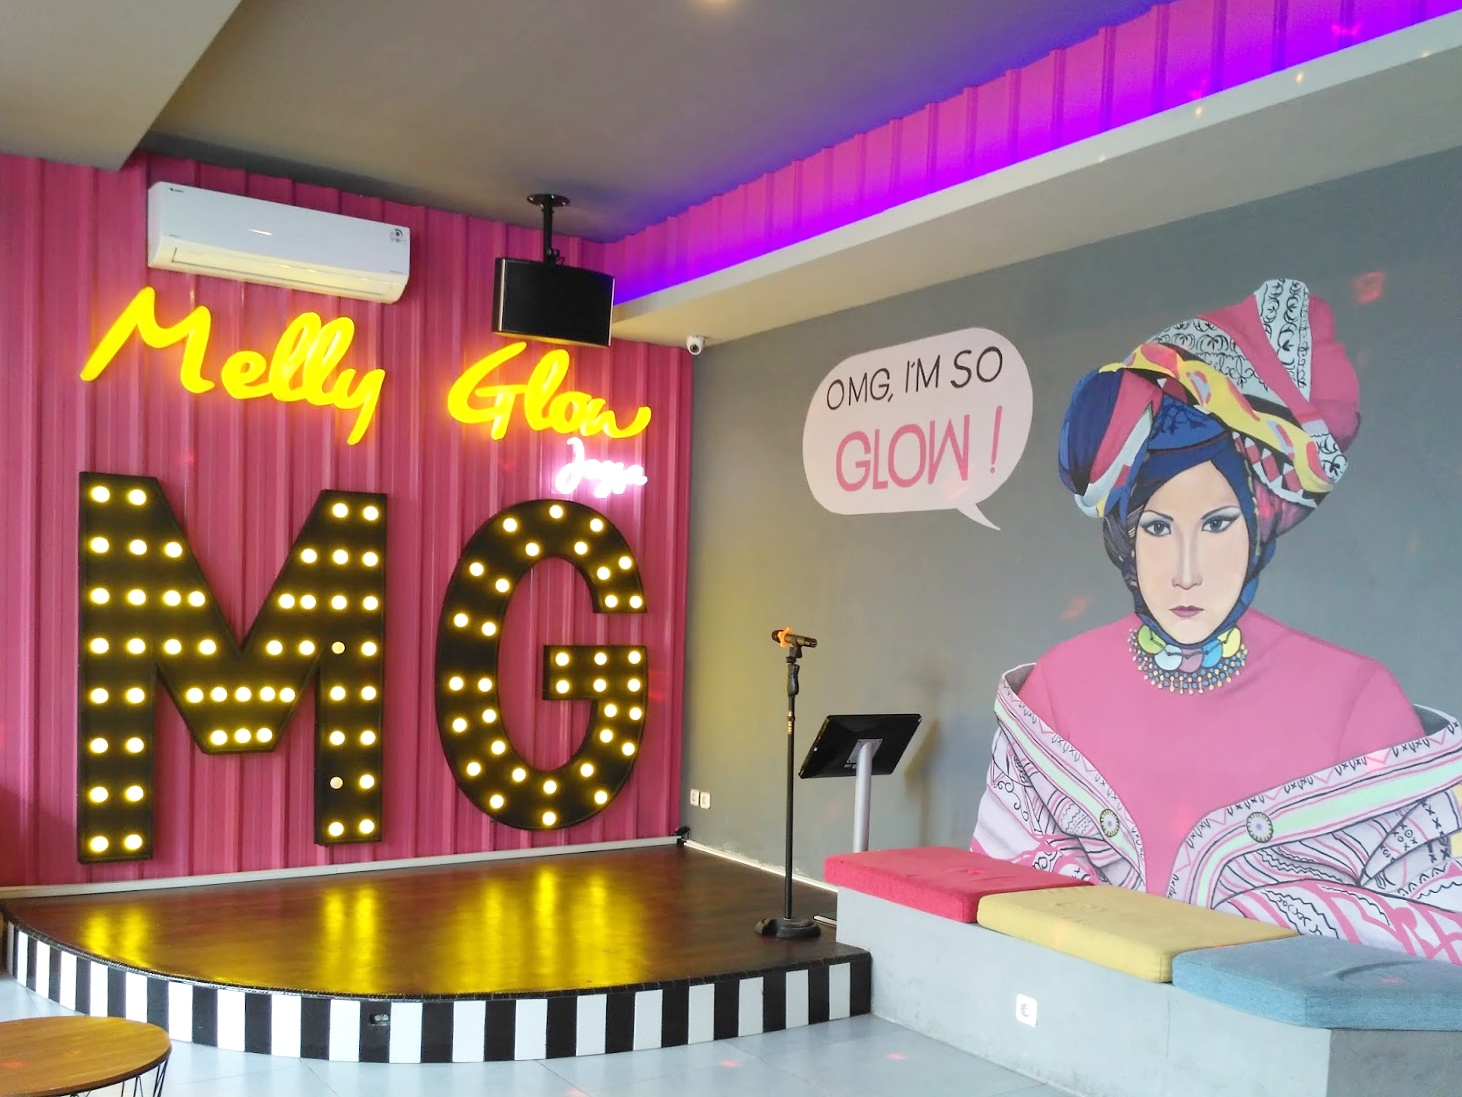 Nyanyi dan dansa di melly glow karaoke jogja a girl for Terrace karaoke jogja